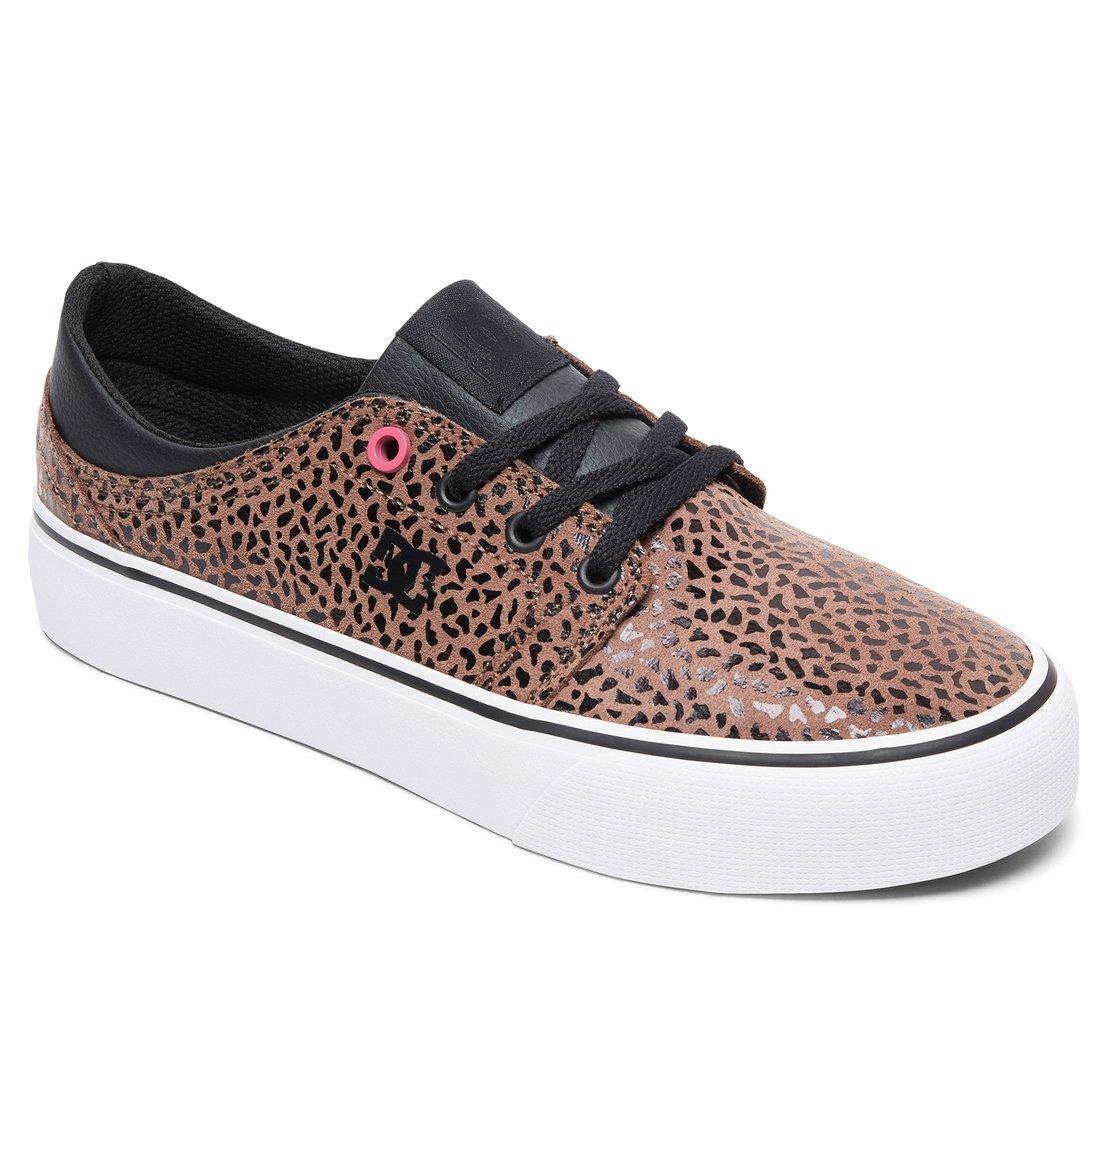 DC Women's Trase SE Skateboarding Shoe B077V97853 8 B(M) US|Cheetah Print